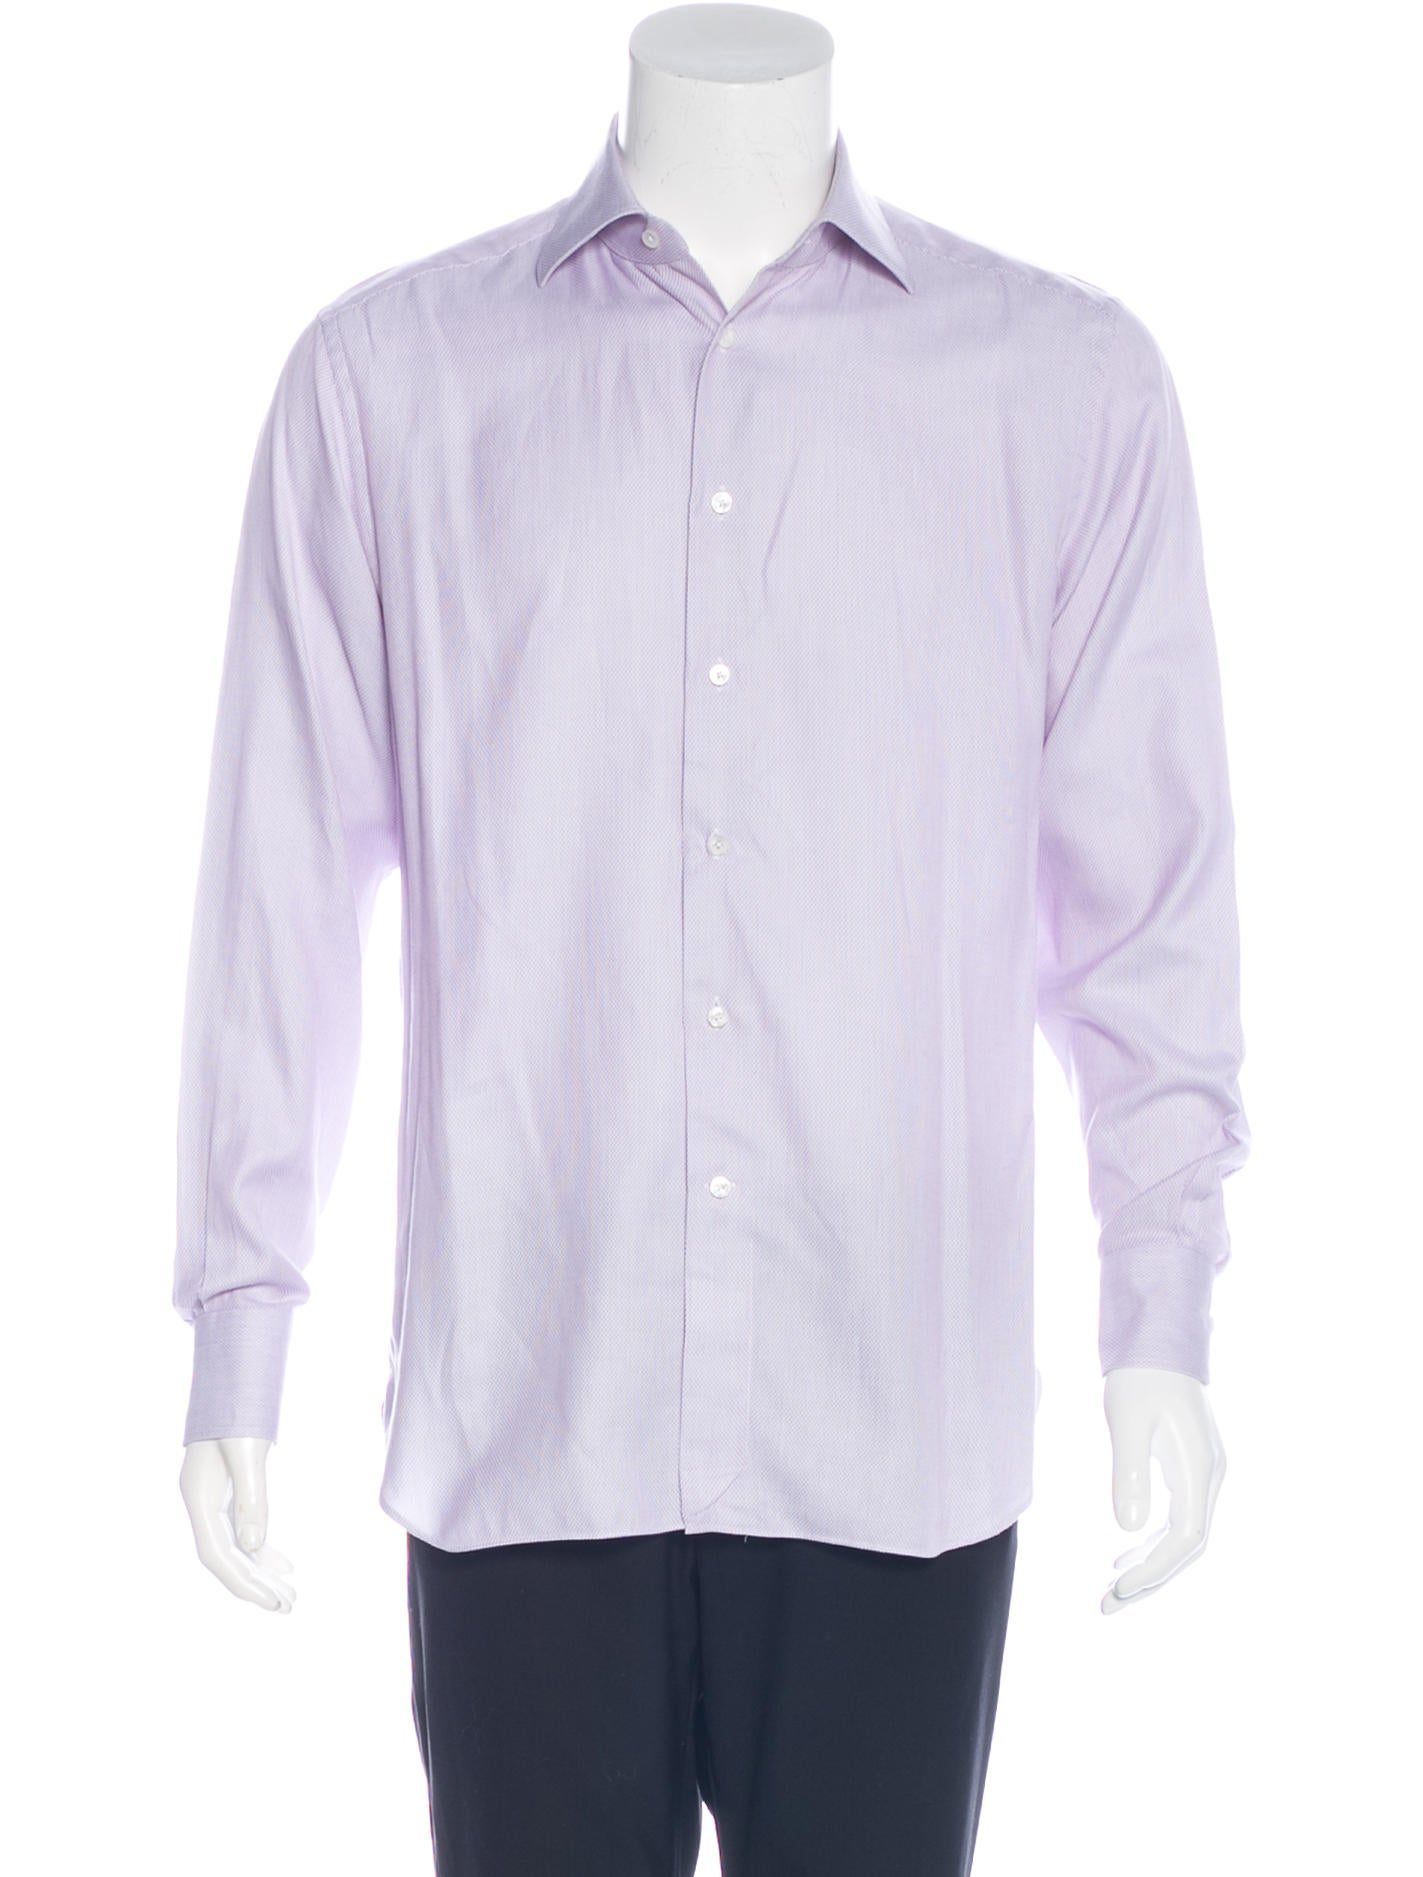 ermenegildo zegna woven dress shirt clothing zgn24855 the realreal. Black Bedroom Furniture Sets. Home Design Ideas